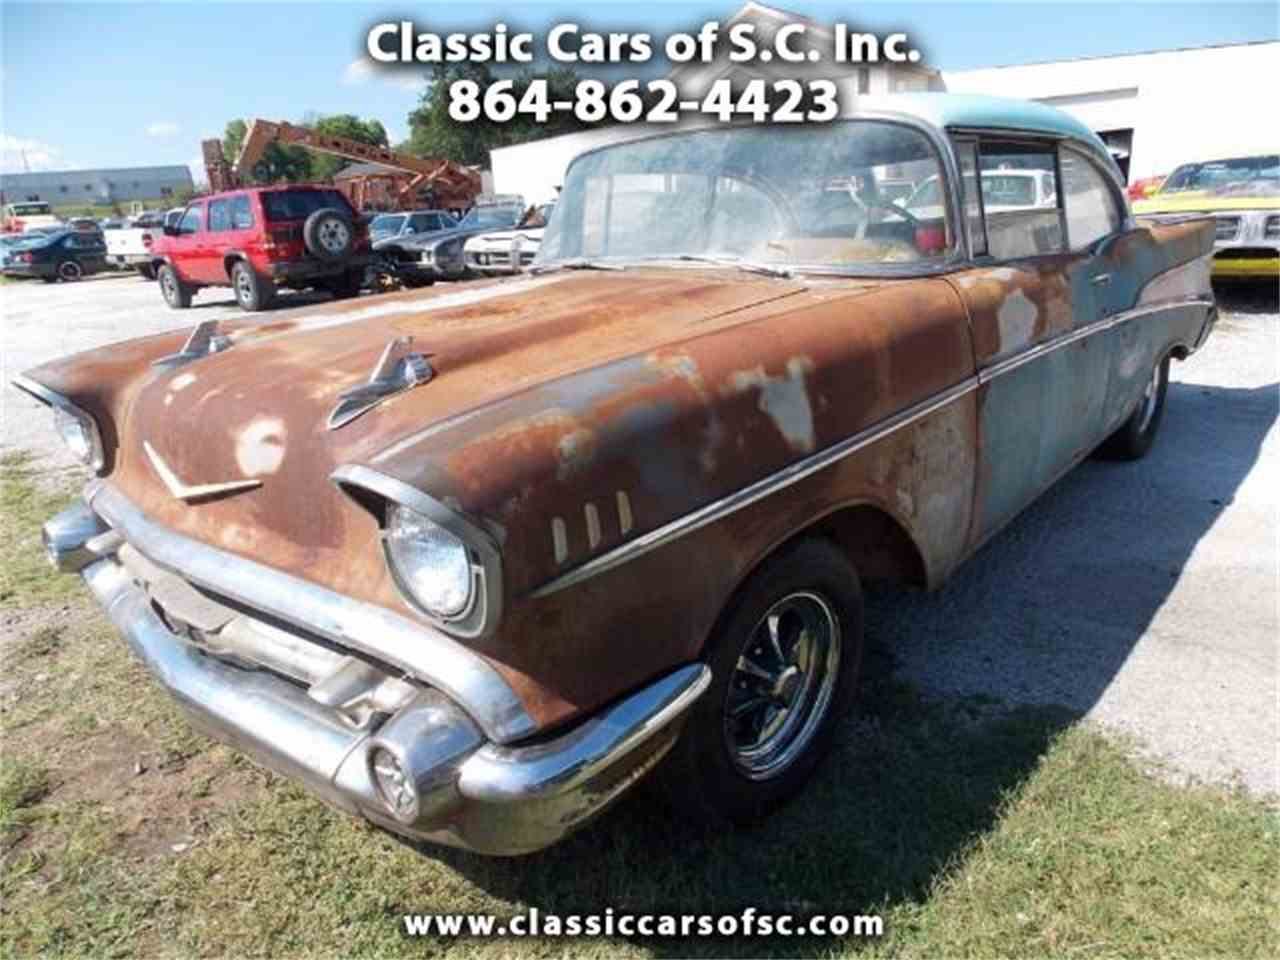 1957 Chevrolet Bel Air for Sale   ClassicCars.com   CC-1035950